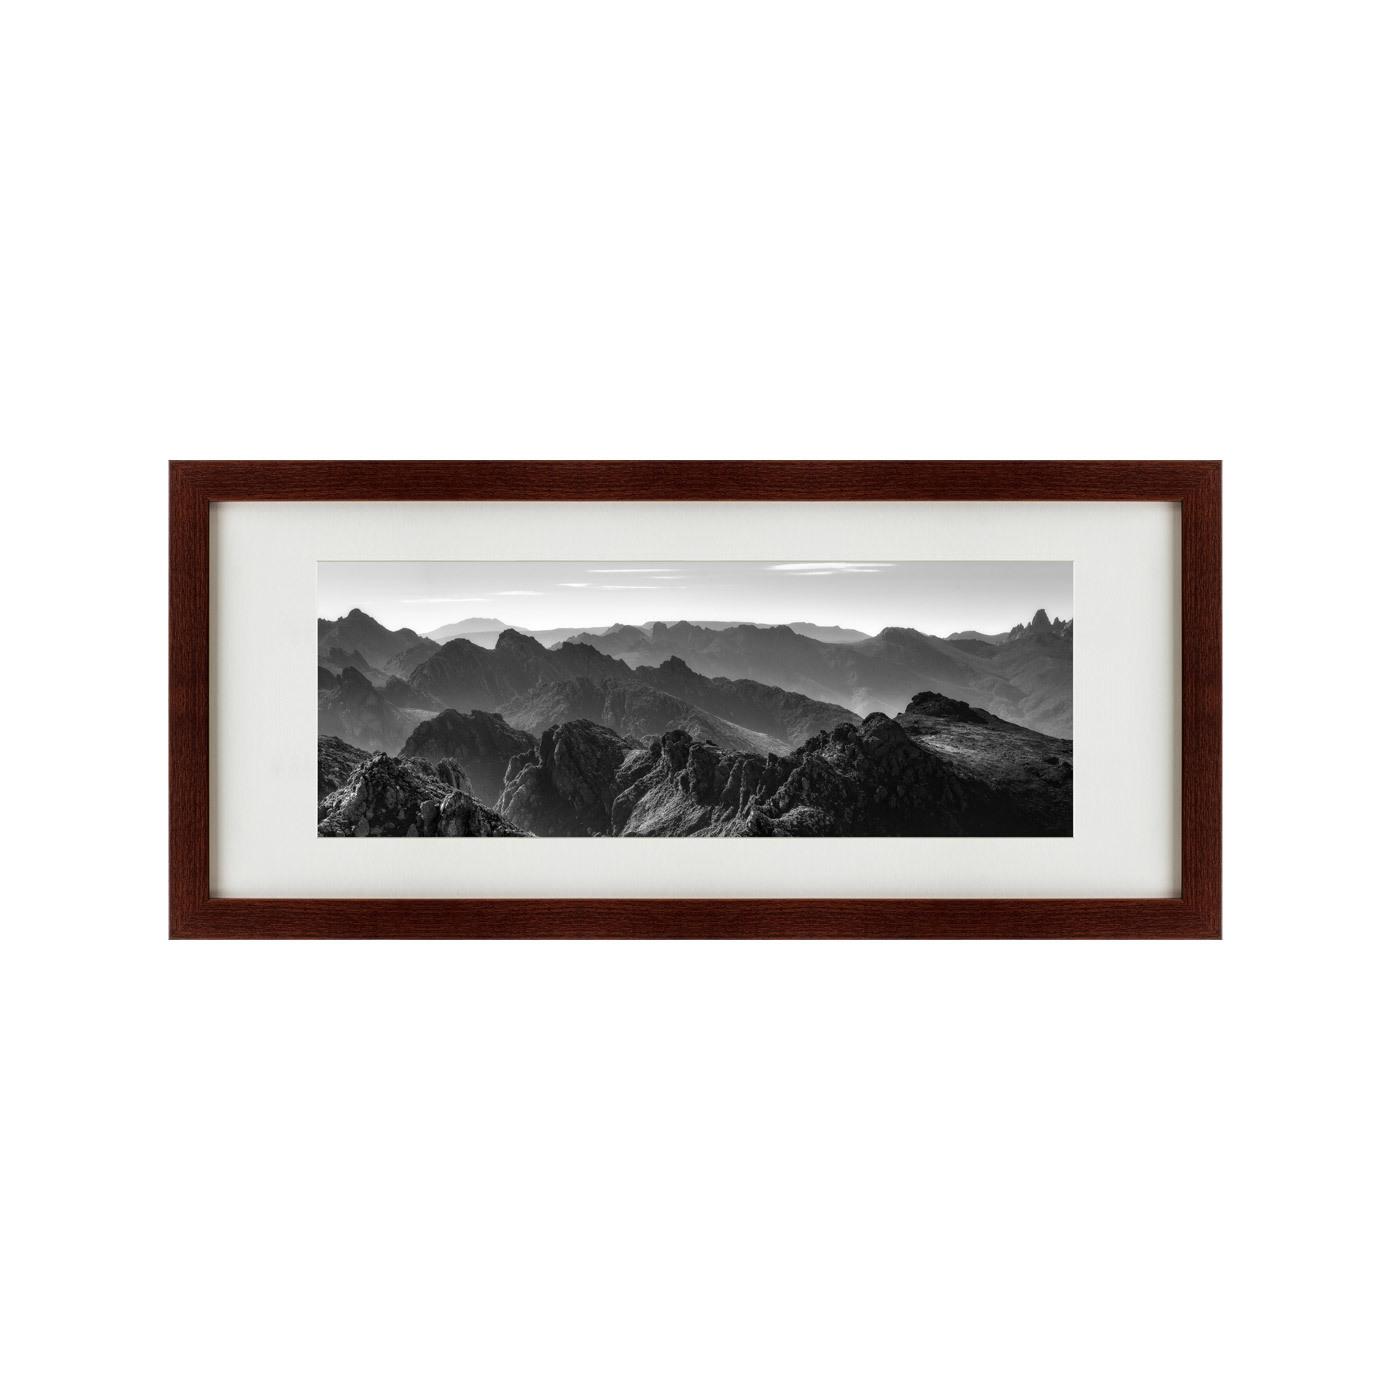 {} Картины в Квартиру Картина Над Горами (35х77 см) картины в квартиру картина над горами 35х77 см